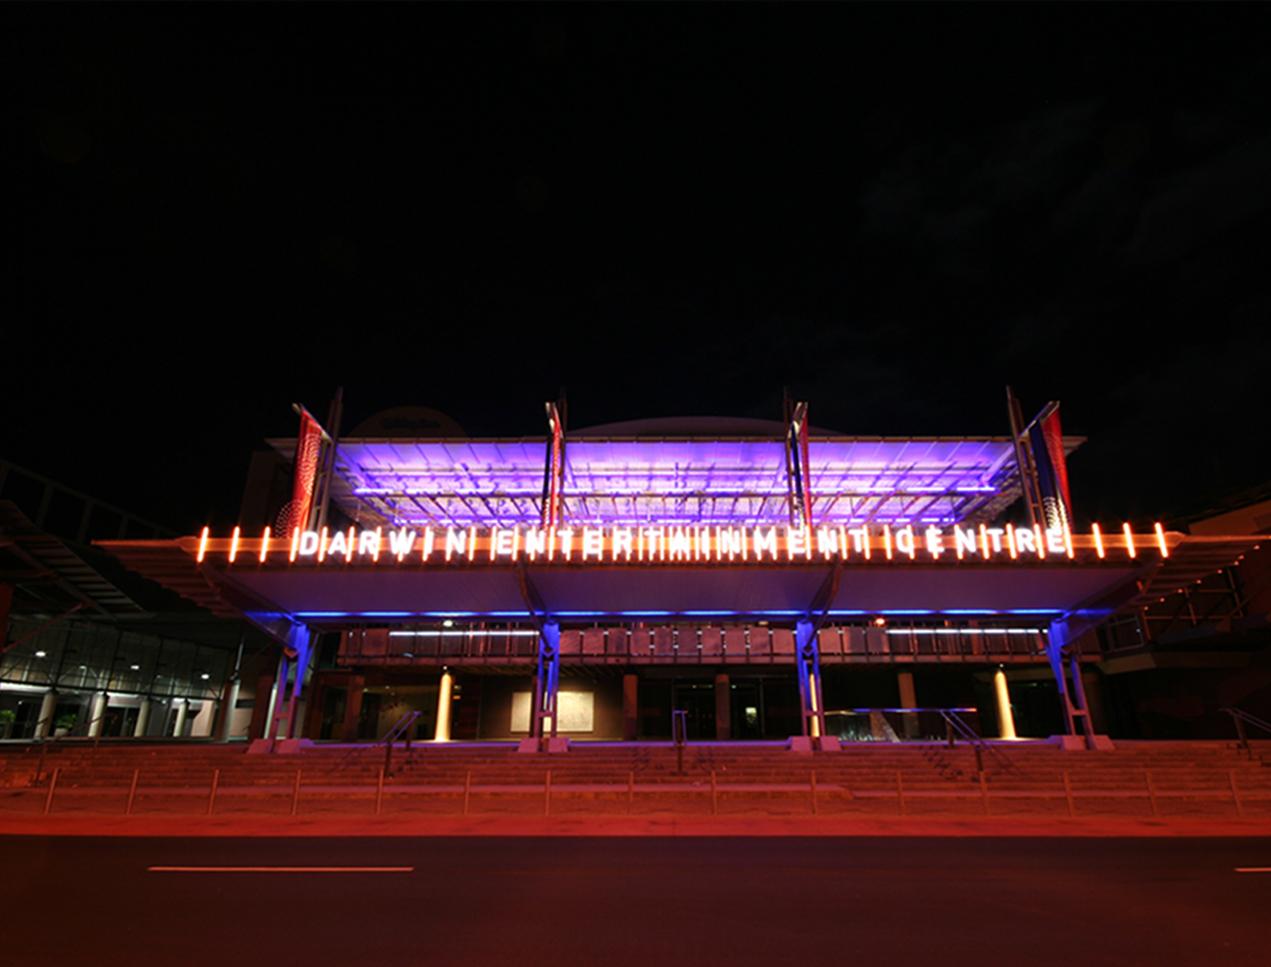 Darwin Entertainment Centre Forecourt  - Darwin, NT, 2007